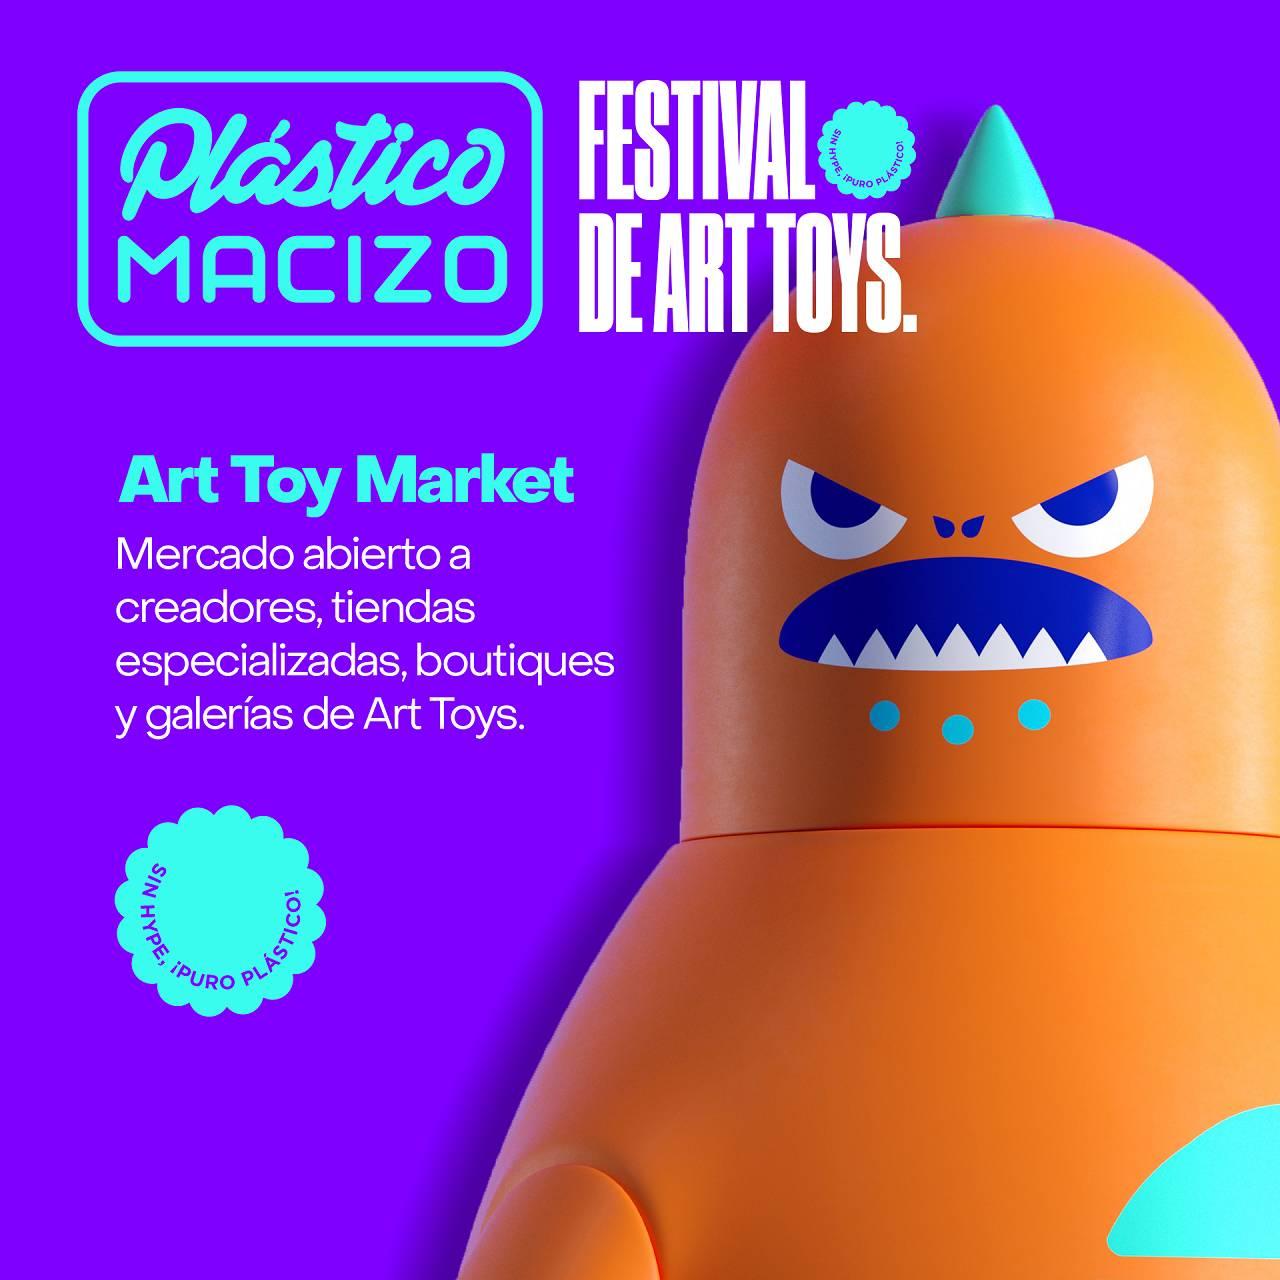 Festival Art Toys Ciudad de México Plástico Macizo